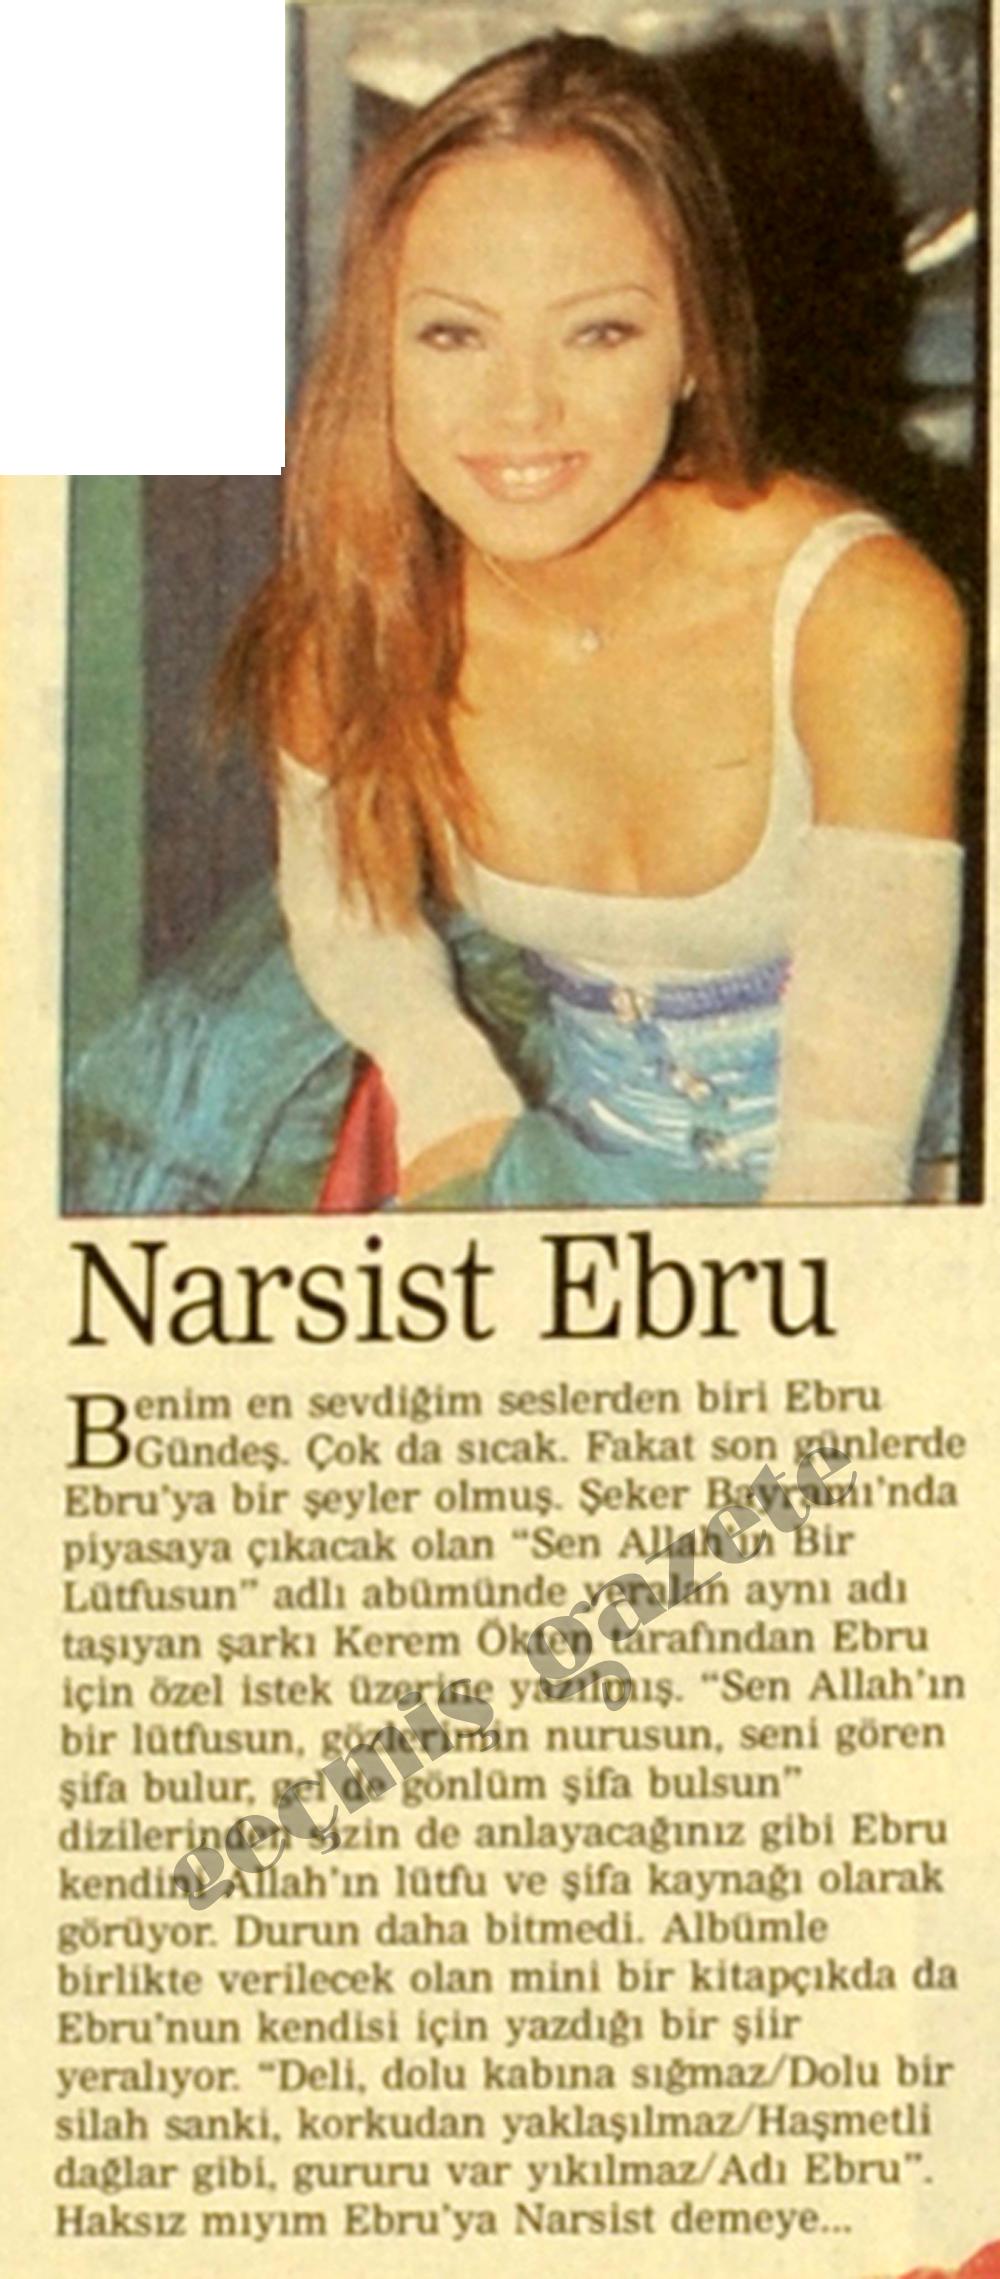 Narsist Ebru